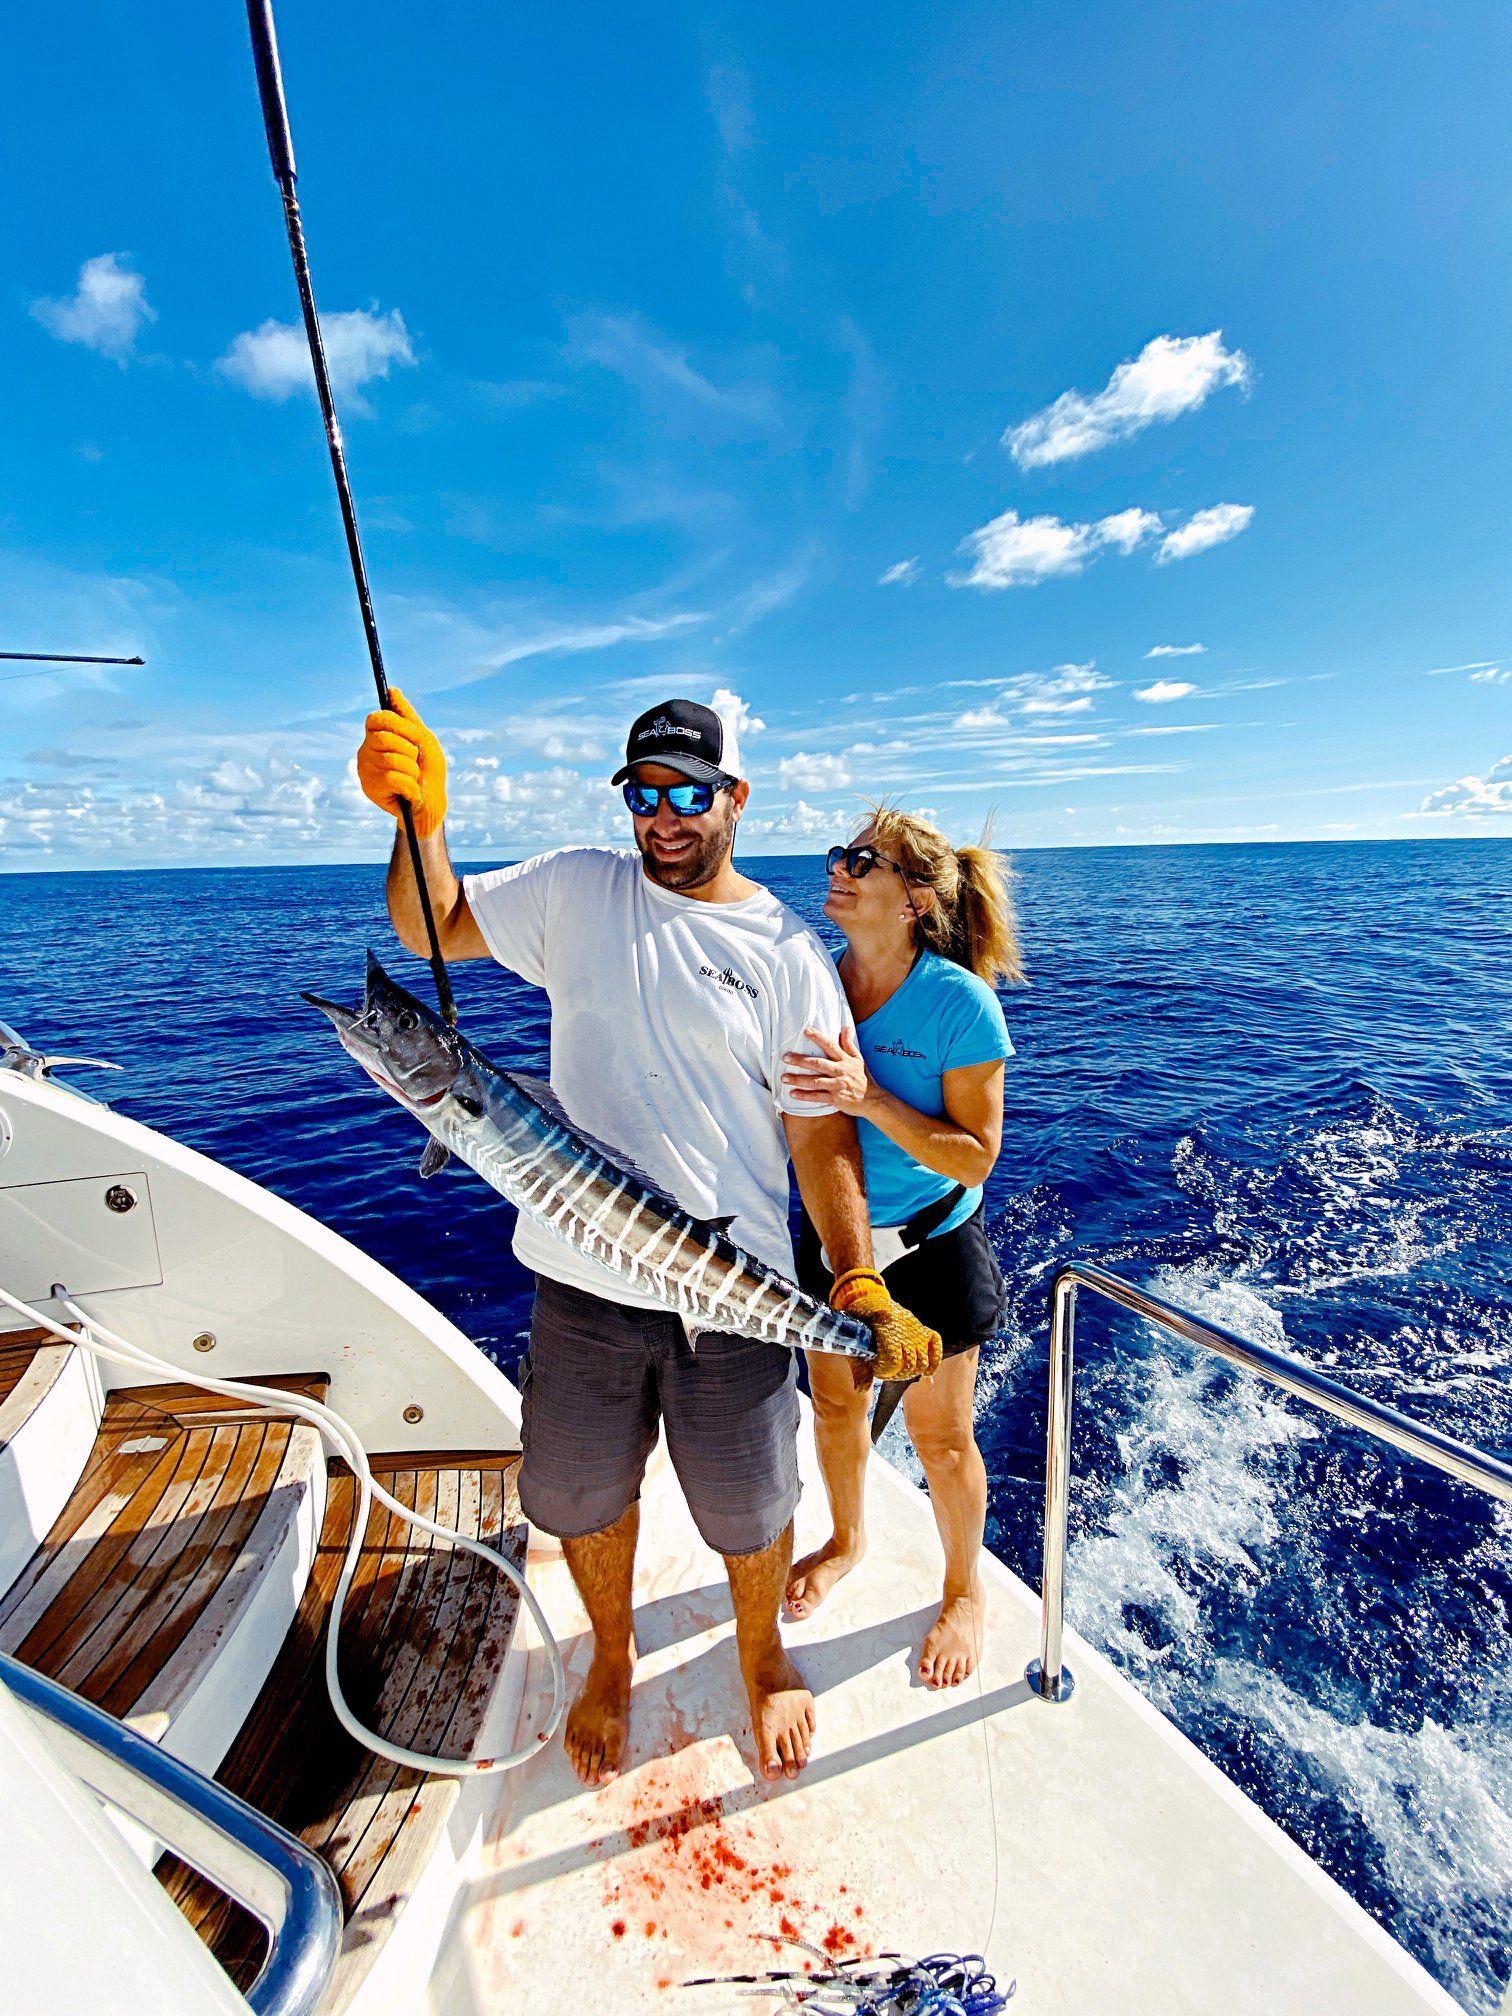 Pin By Epic Yacht Charters On Epic Fishing Fishing Charters Virgin Islands Vacation Sea Fishing